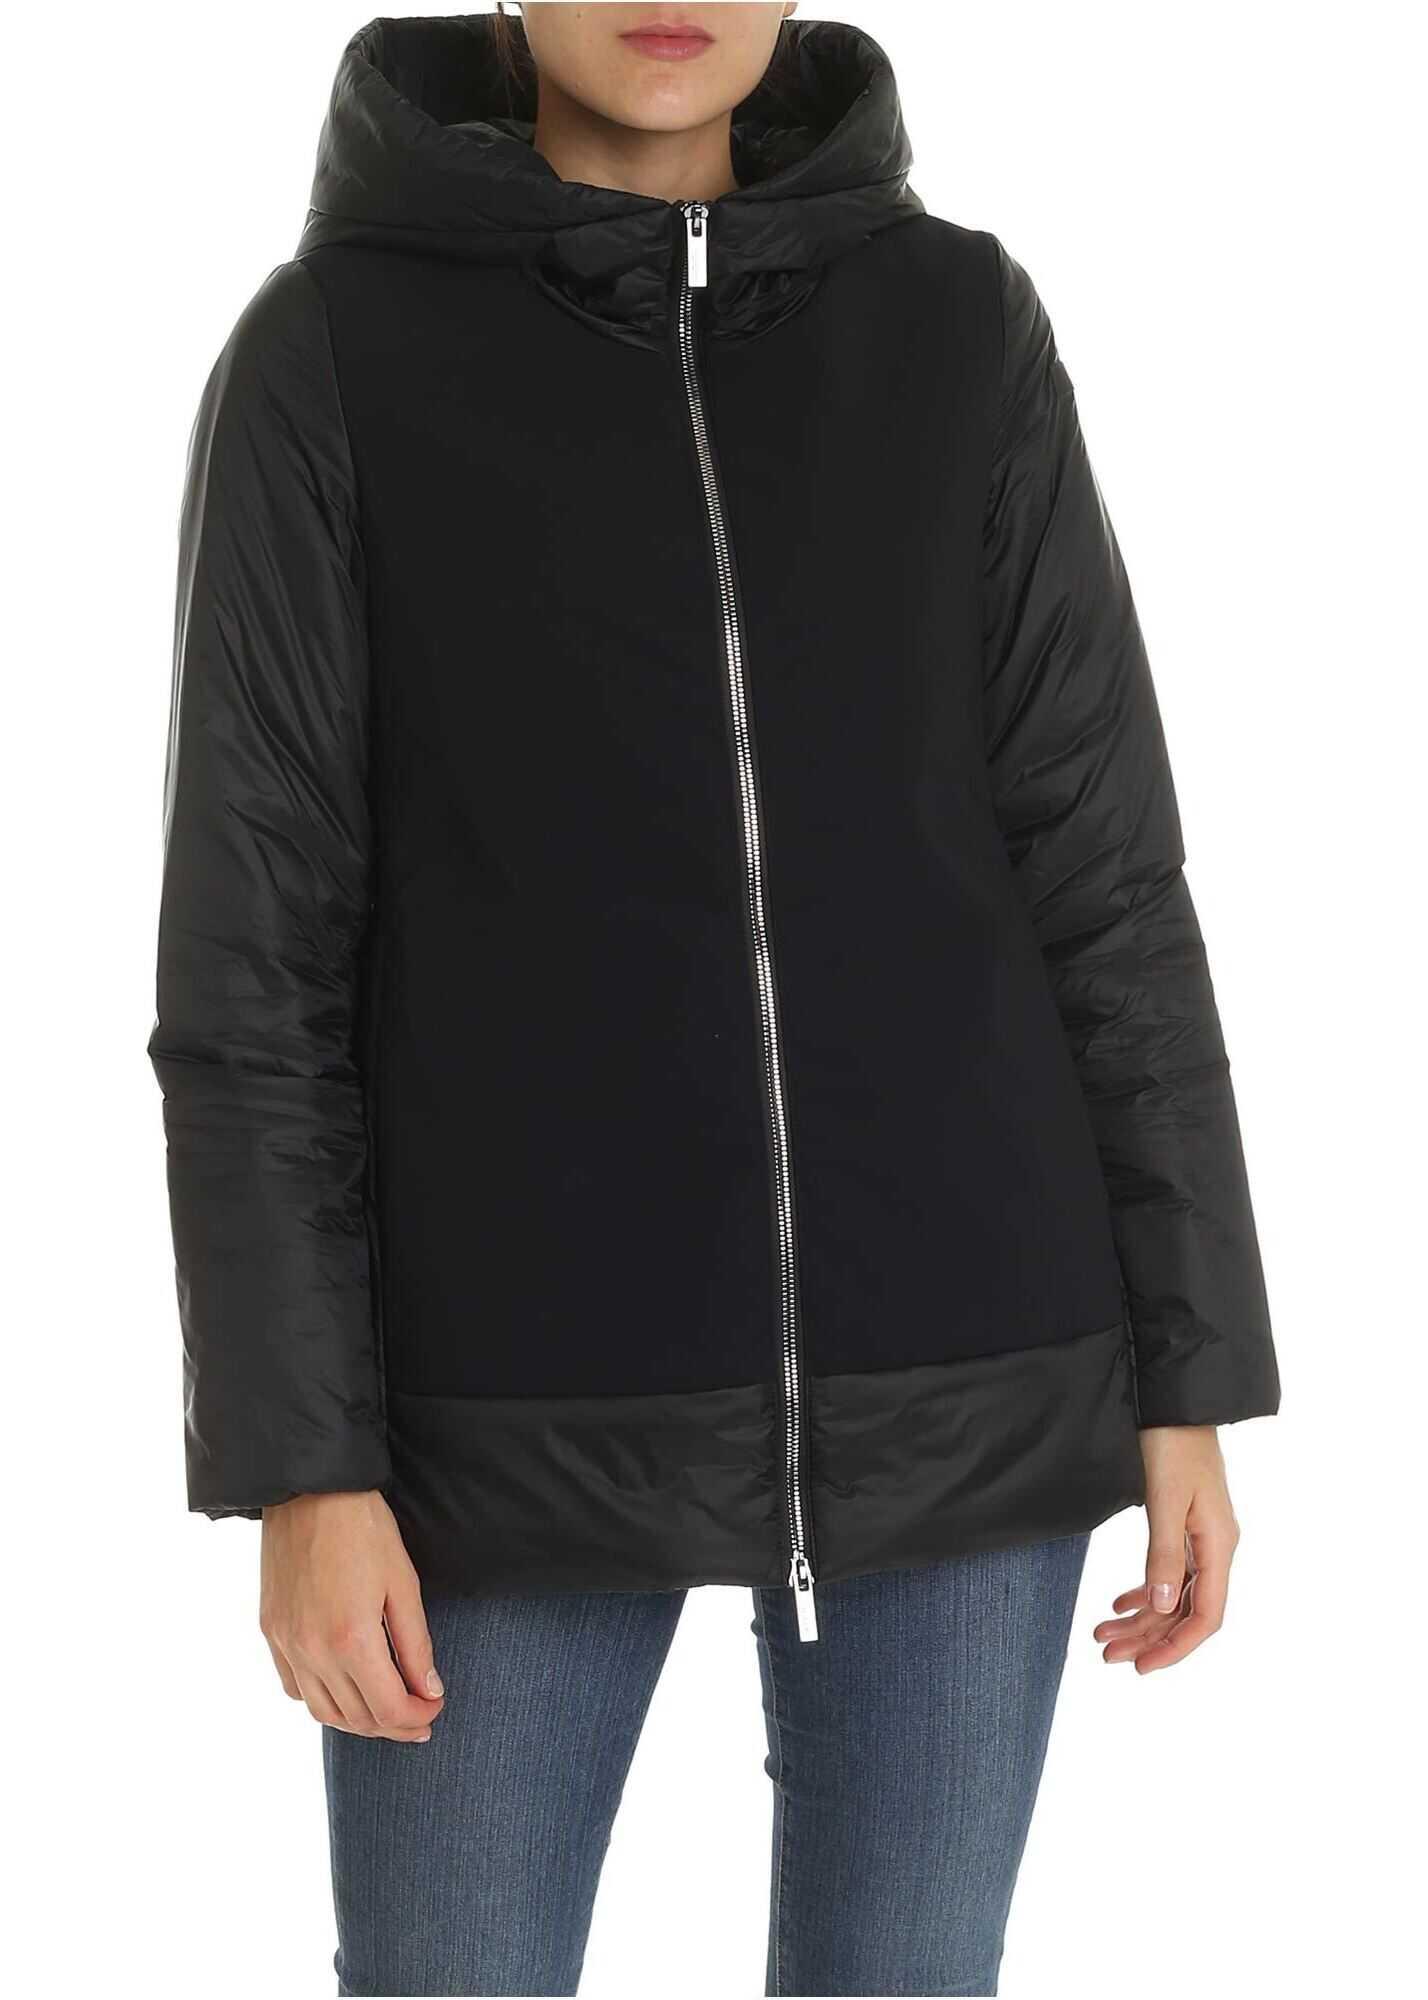 RRD Roberto Ricci Designs Thermo Hybrid Zarina Down Jacket In Black Black